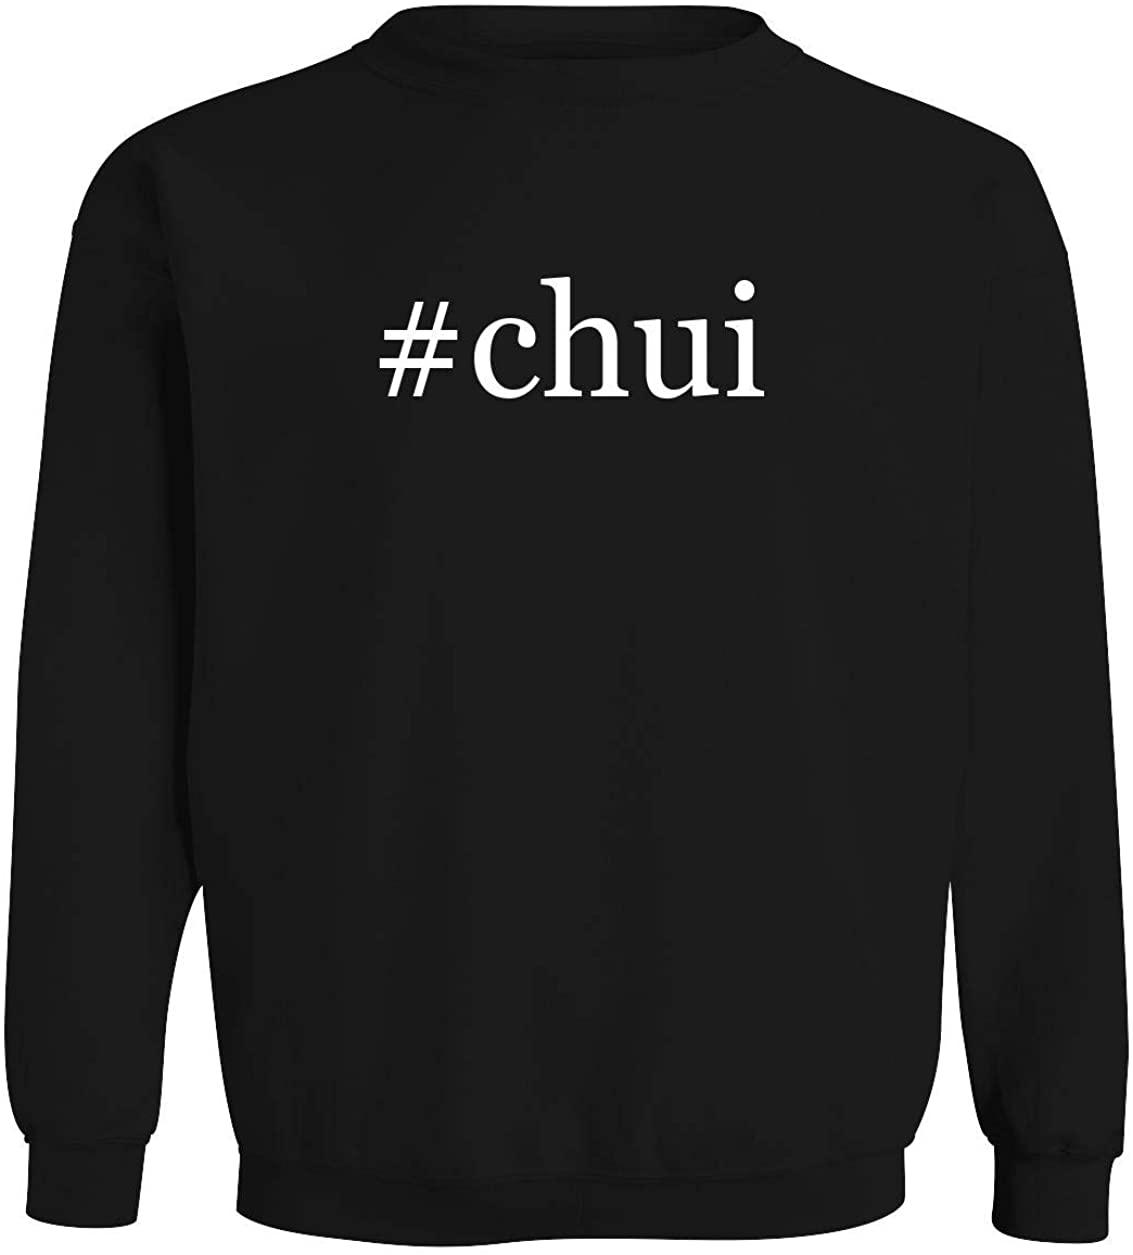 #chui - Men's Hashtag Soft & Comfortable Long Sleeve T-Shirt